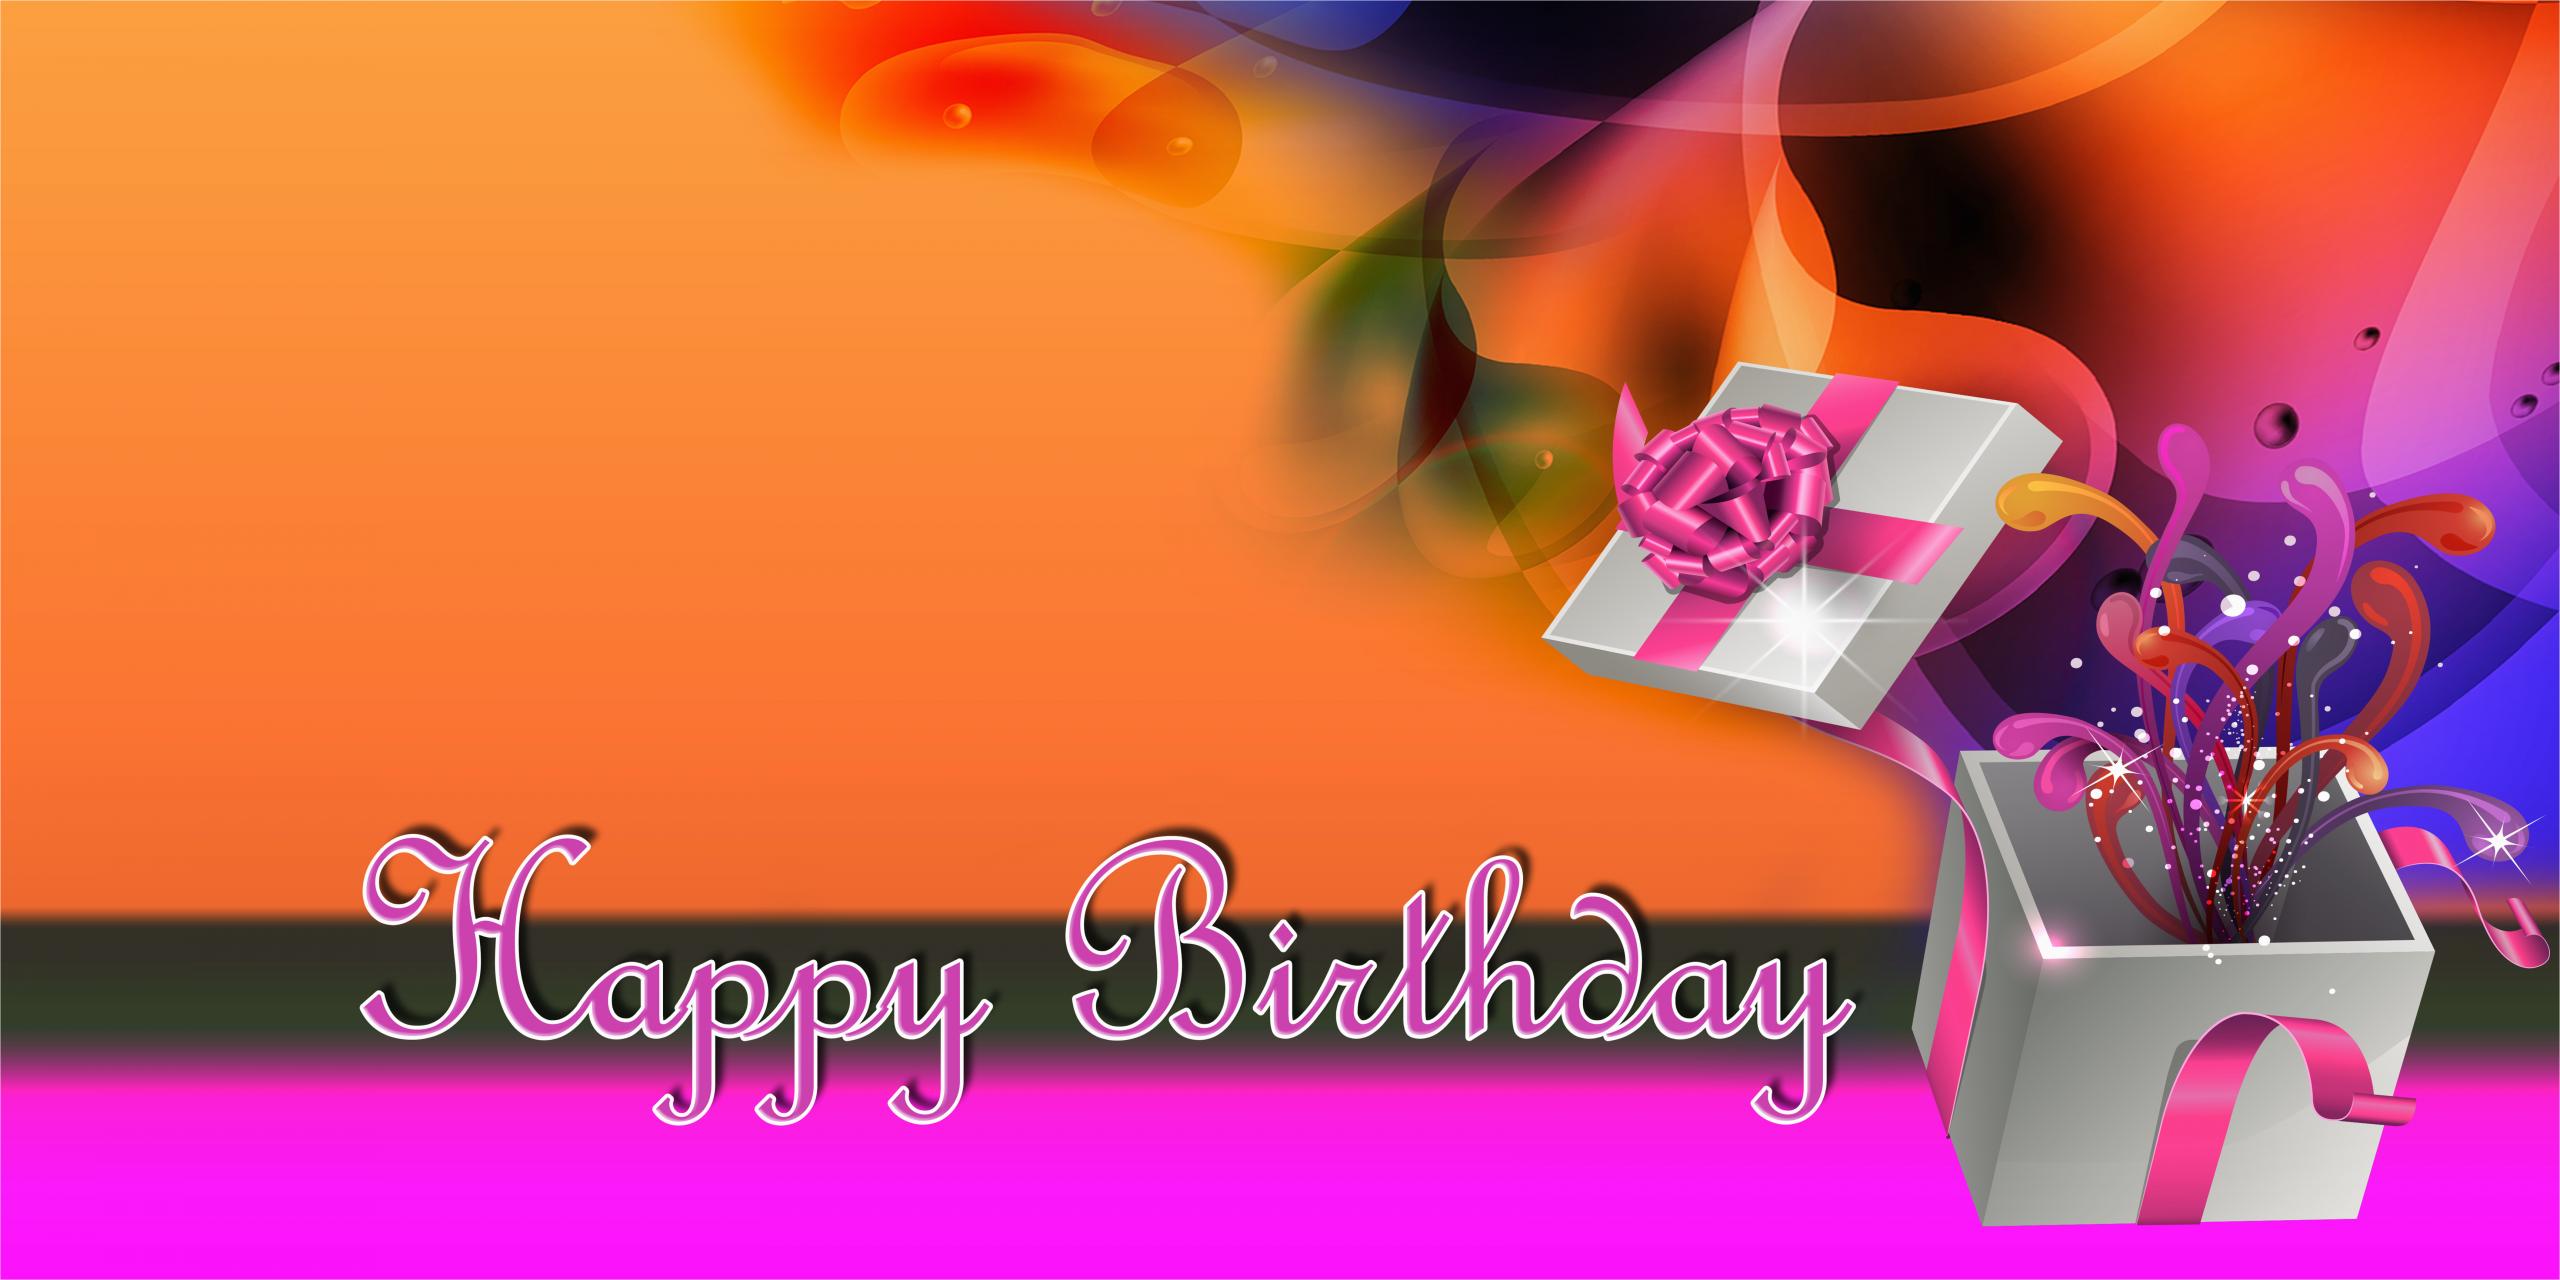 Happy Birthday Banner Images Full Hd Happy Birthday Banner Pink Gift Gatorprints